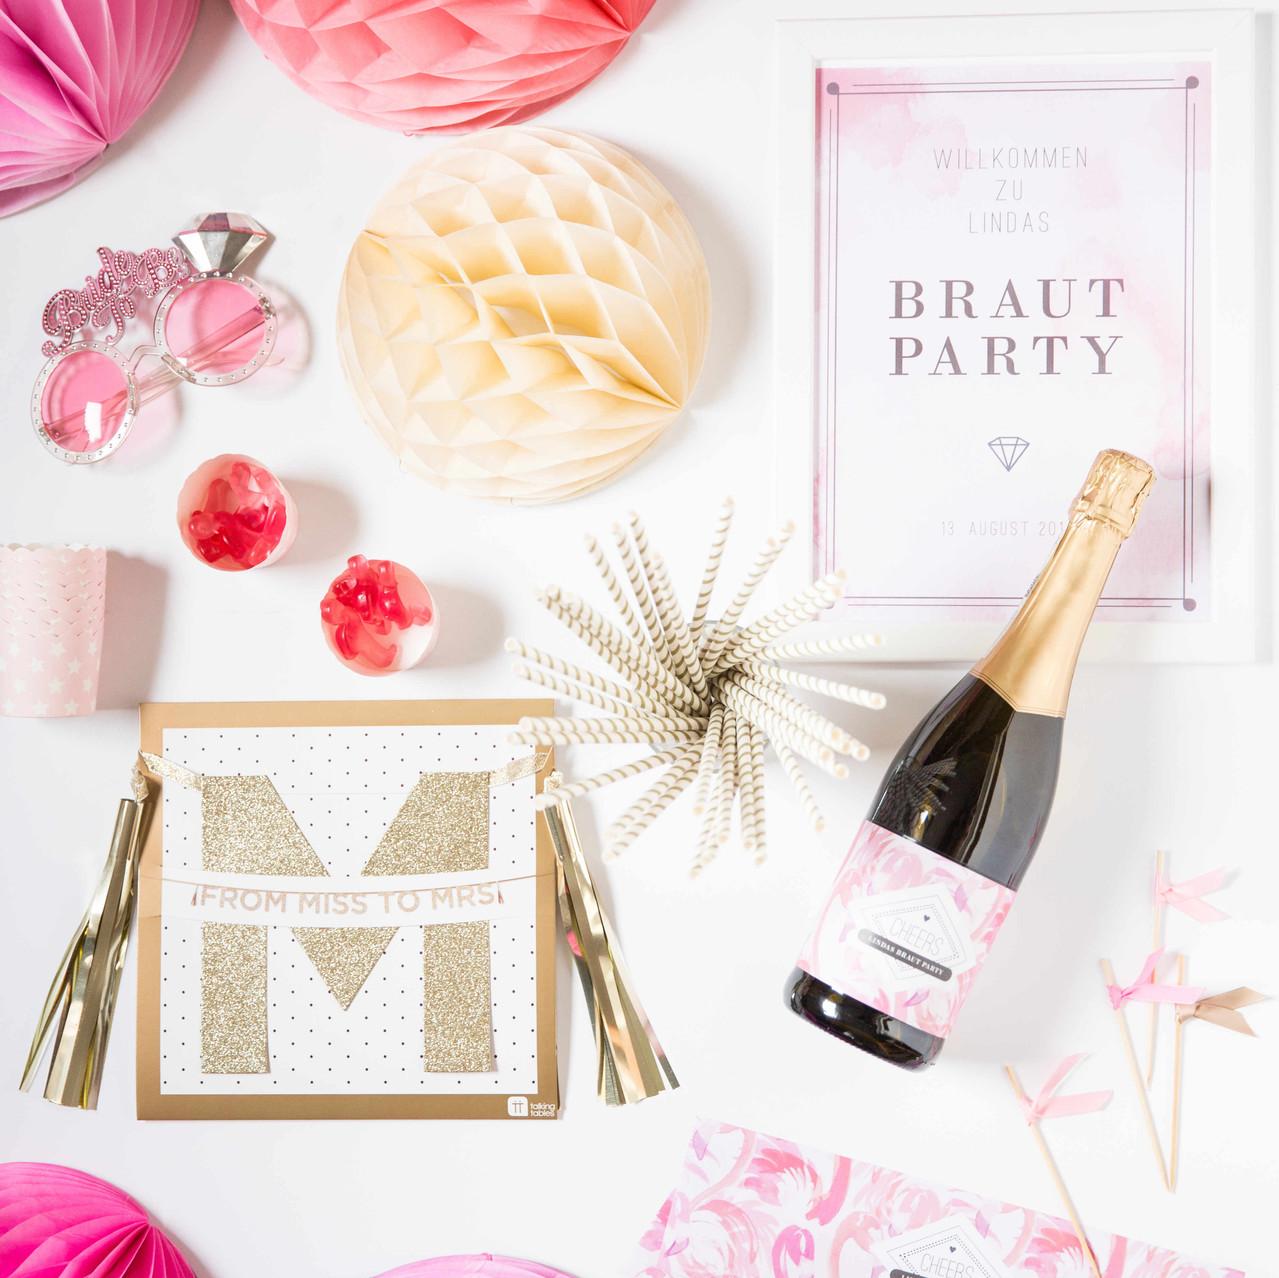 Braut Party Kit